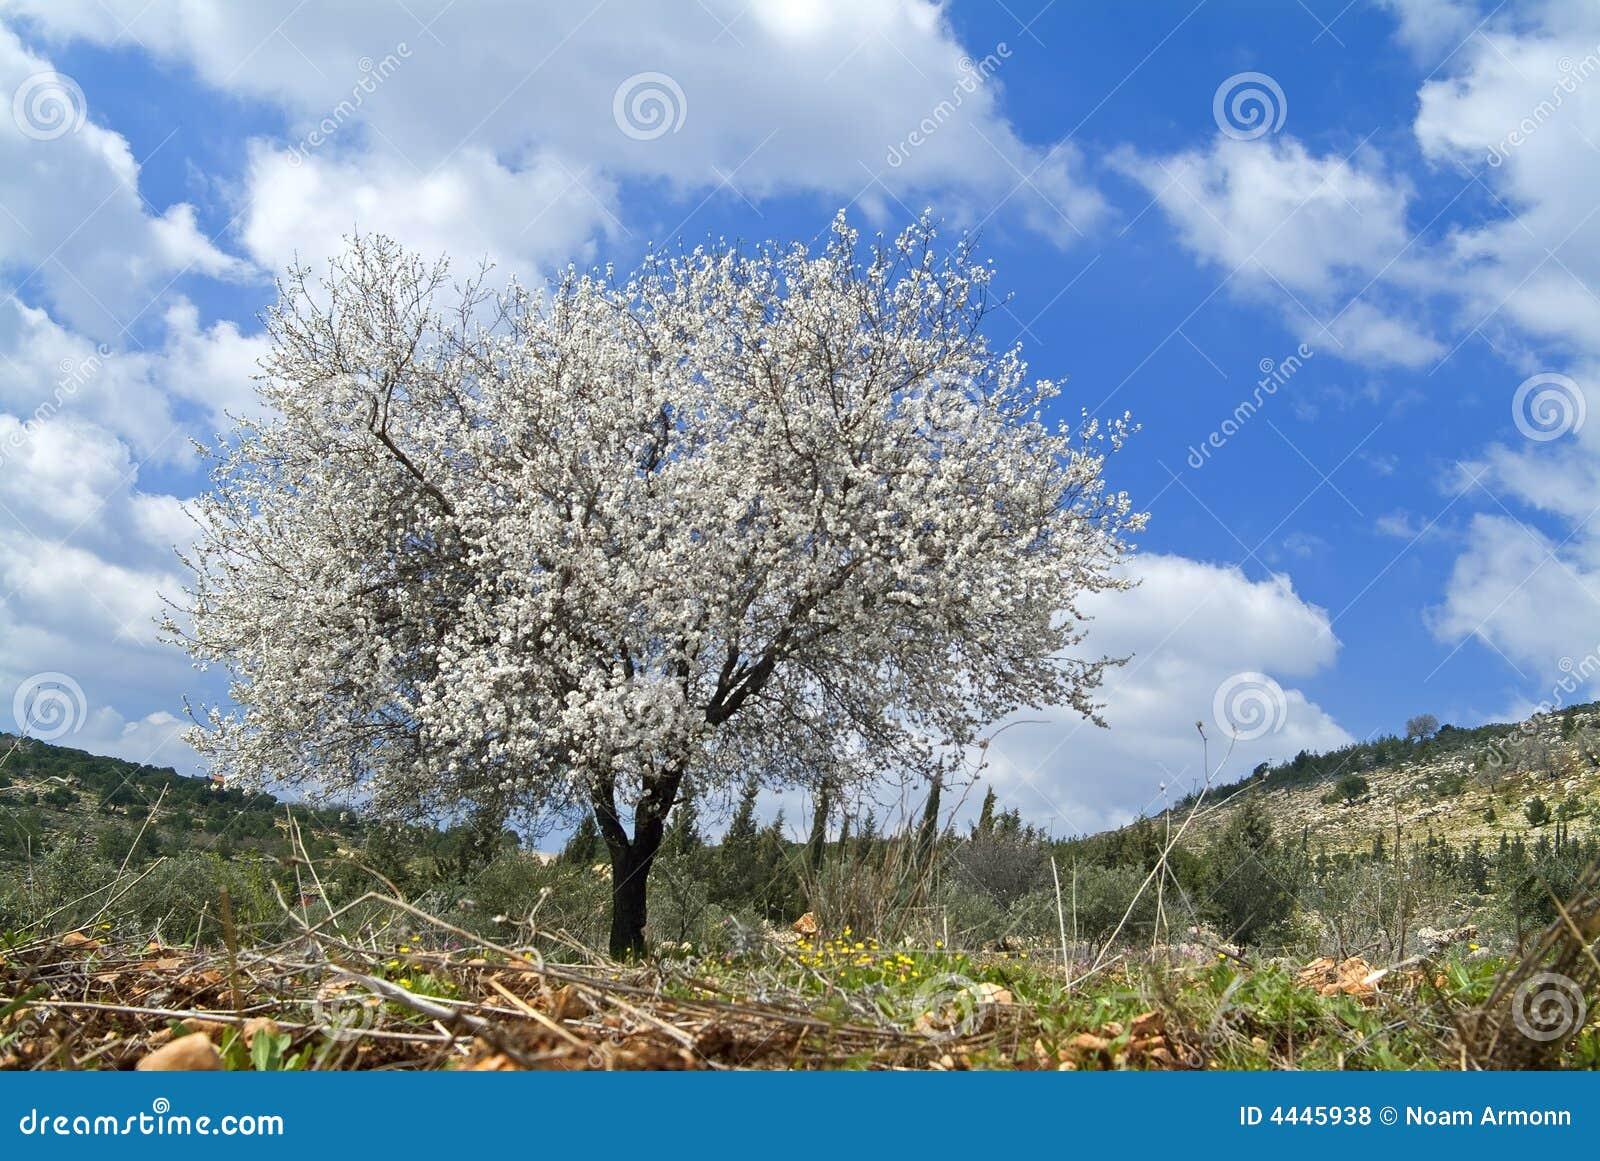 arbre d 39 amande en fleur photo stock image du amande beau 4445938. Black Bedroom Furniture Sets. Home Design Ideas